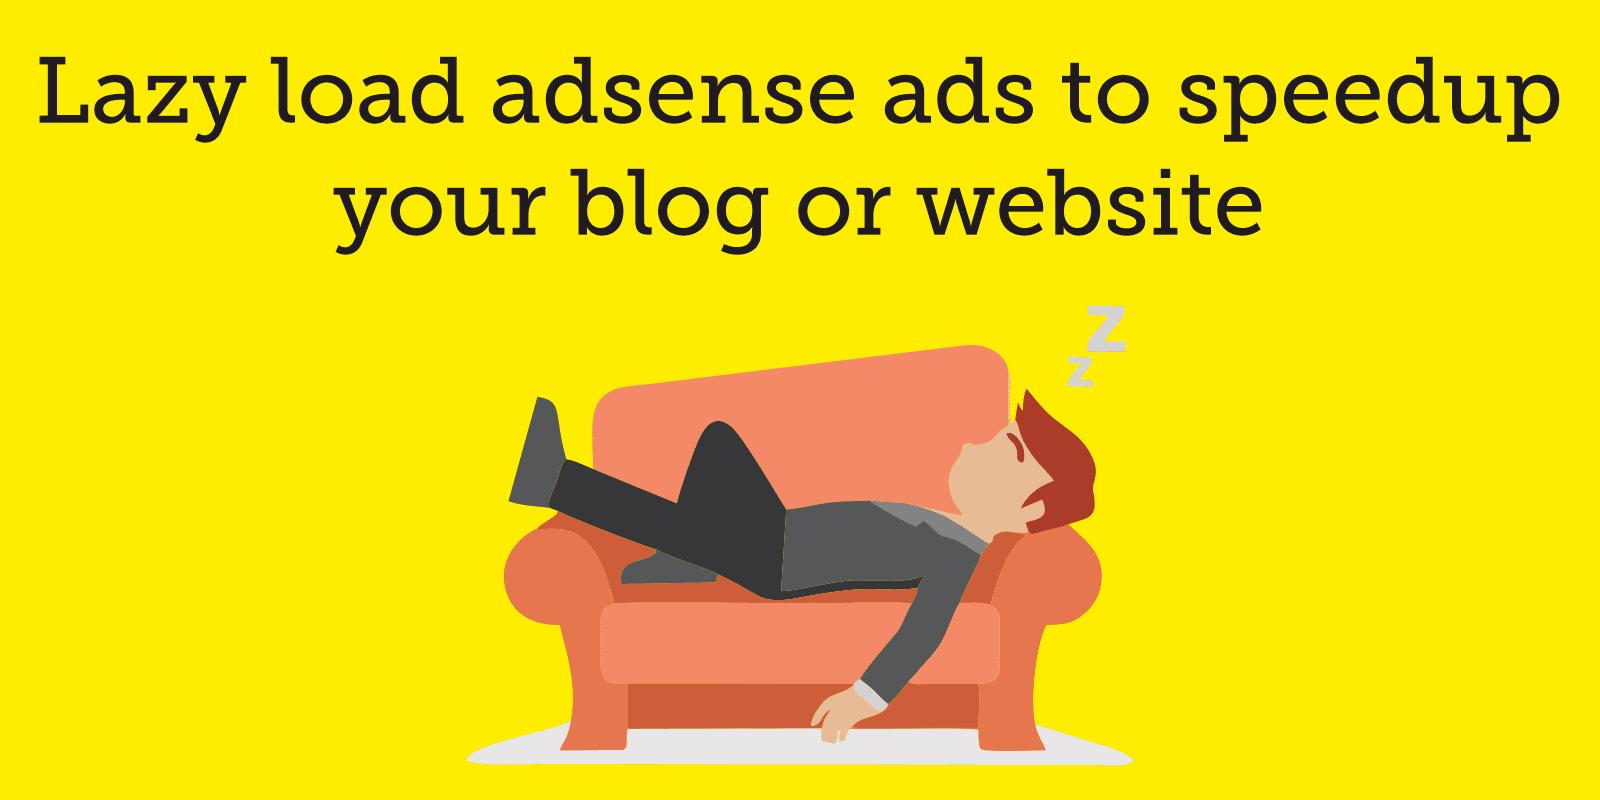 lazy loading adsense ads for speedy blog loading